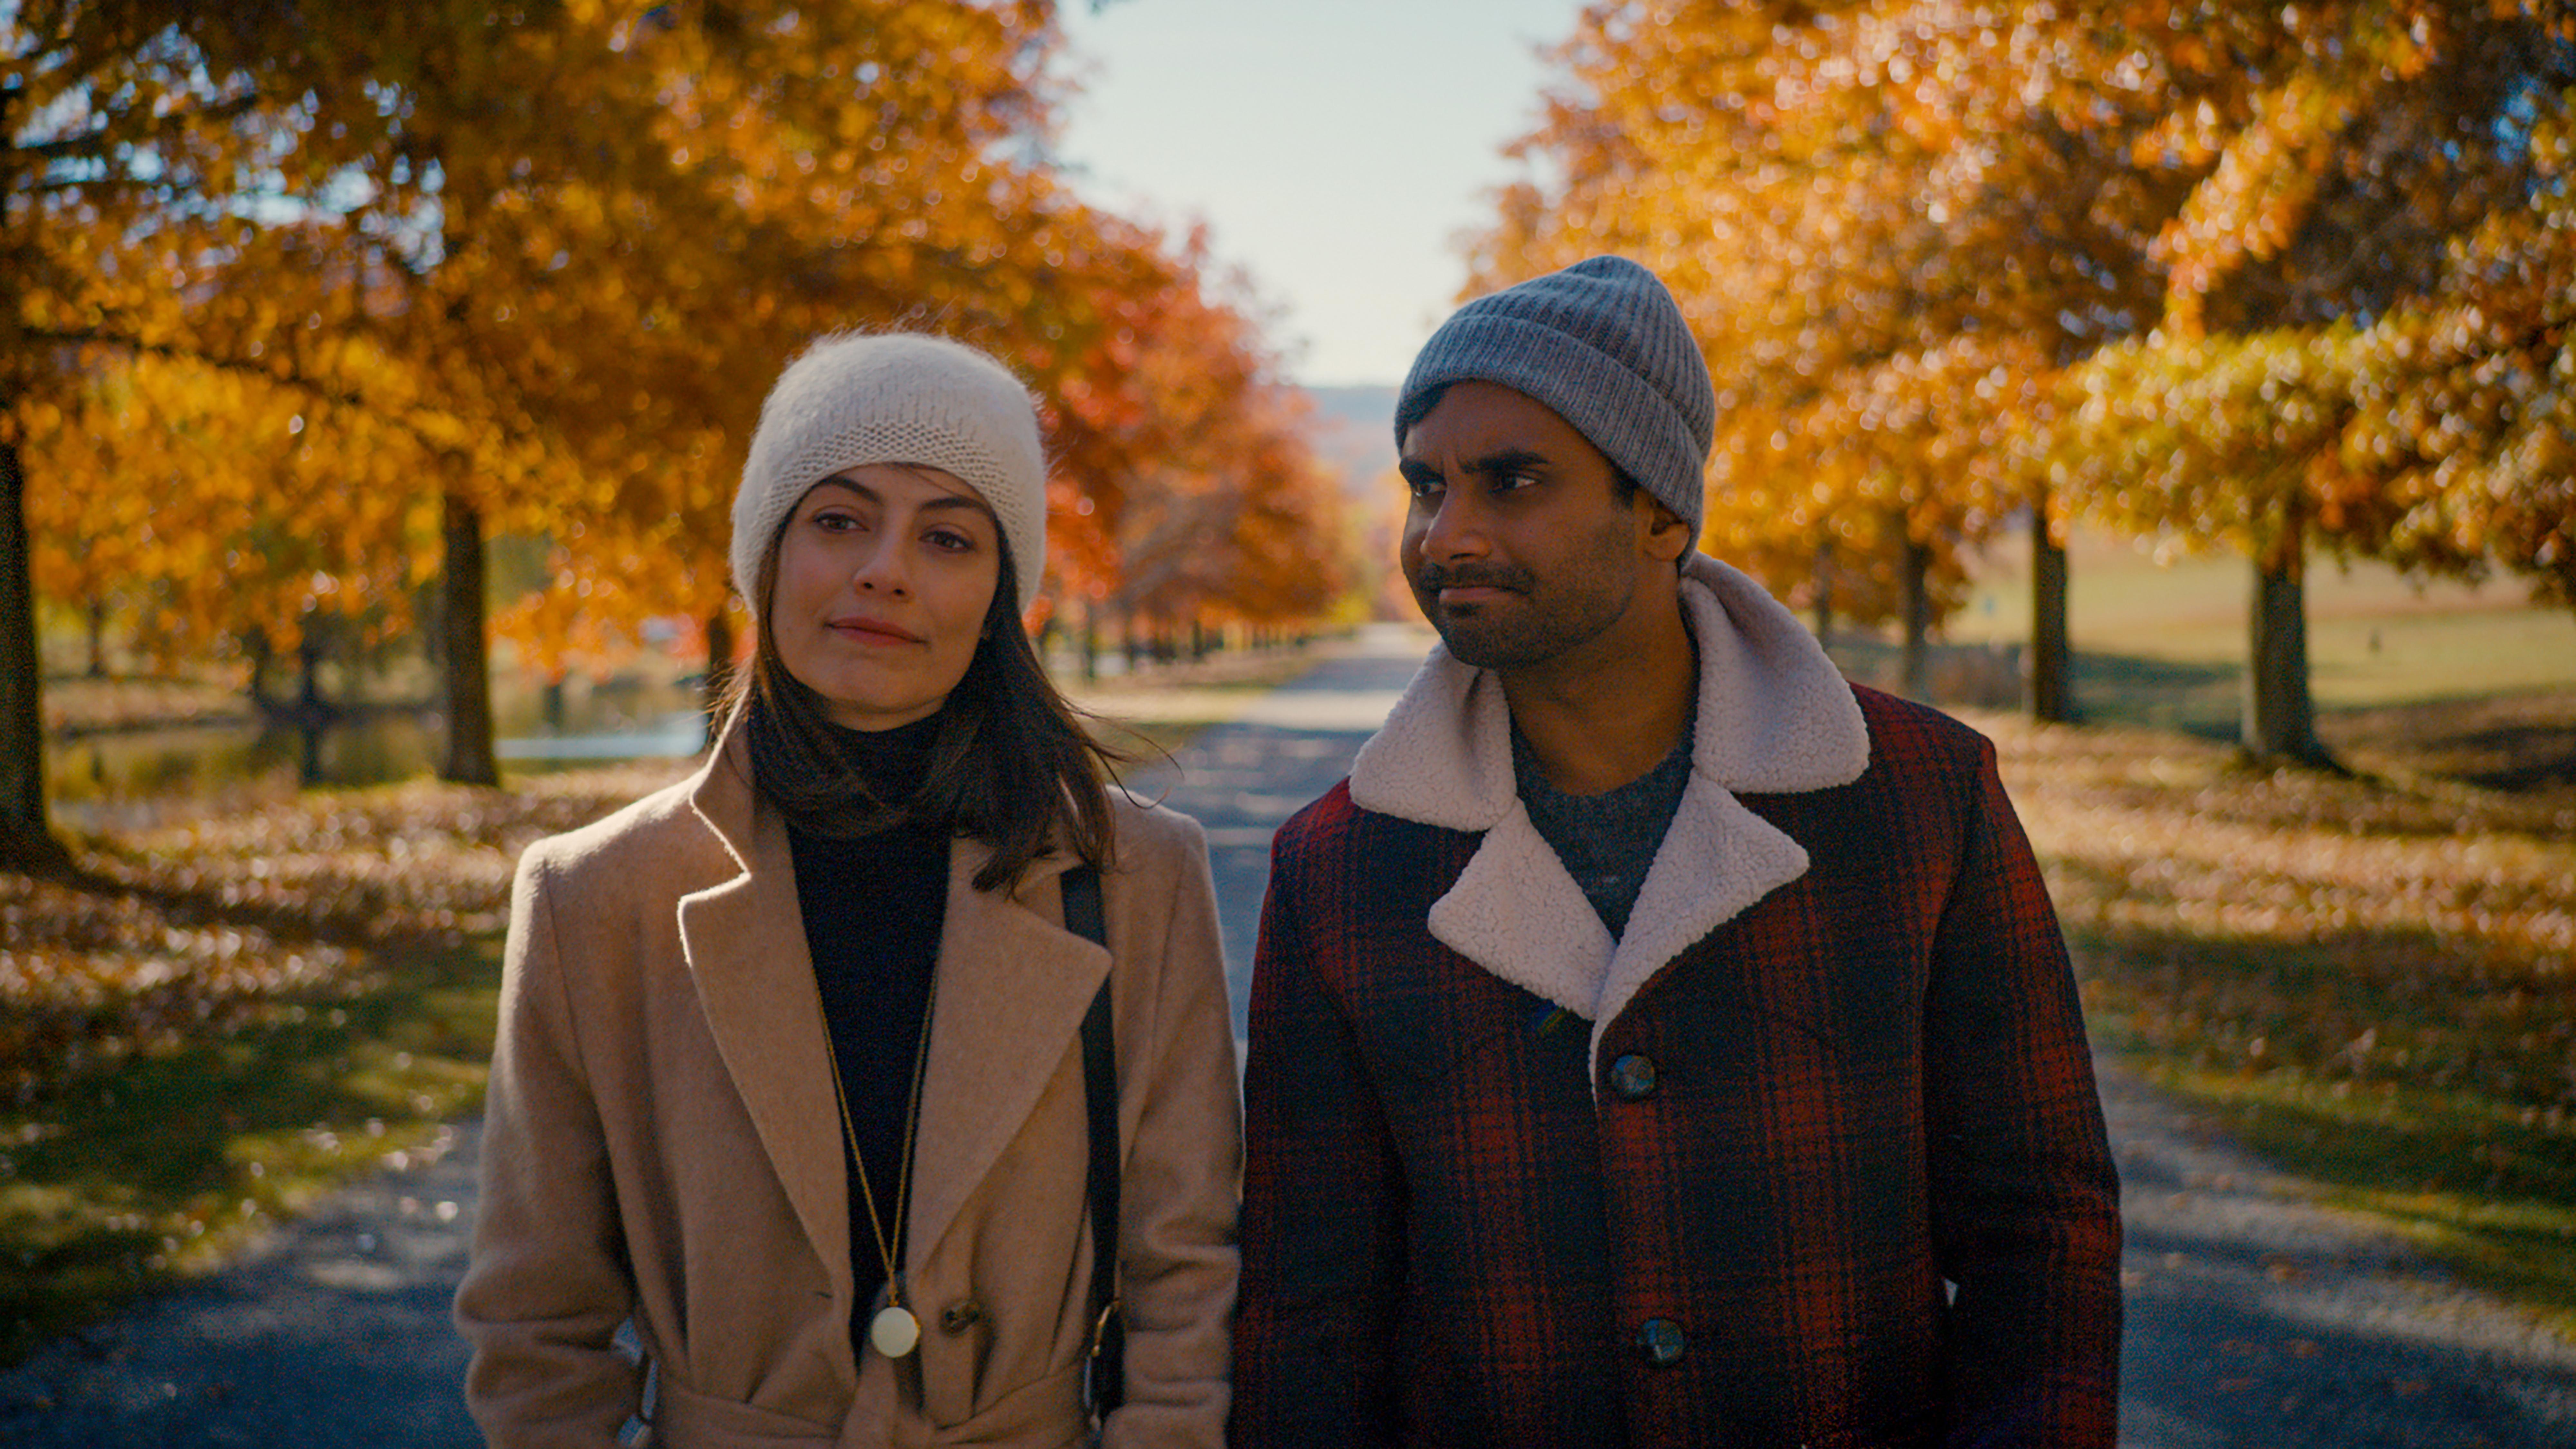 Alessandra Mastronardi as Francesca and Aziz Ansari as Dev in season 2 of Master of None.